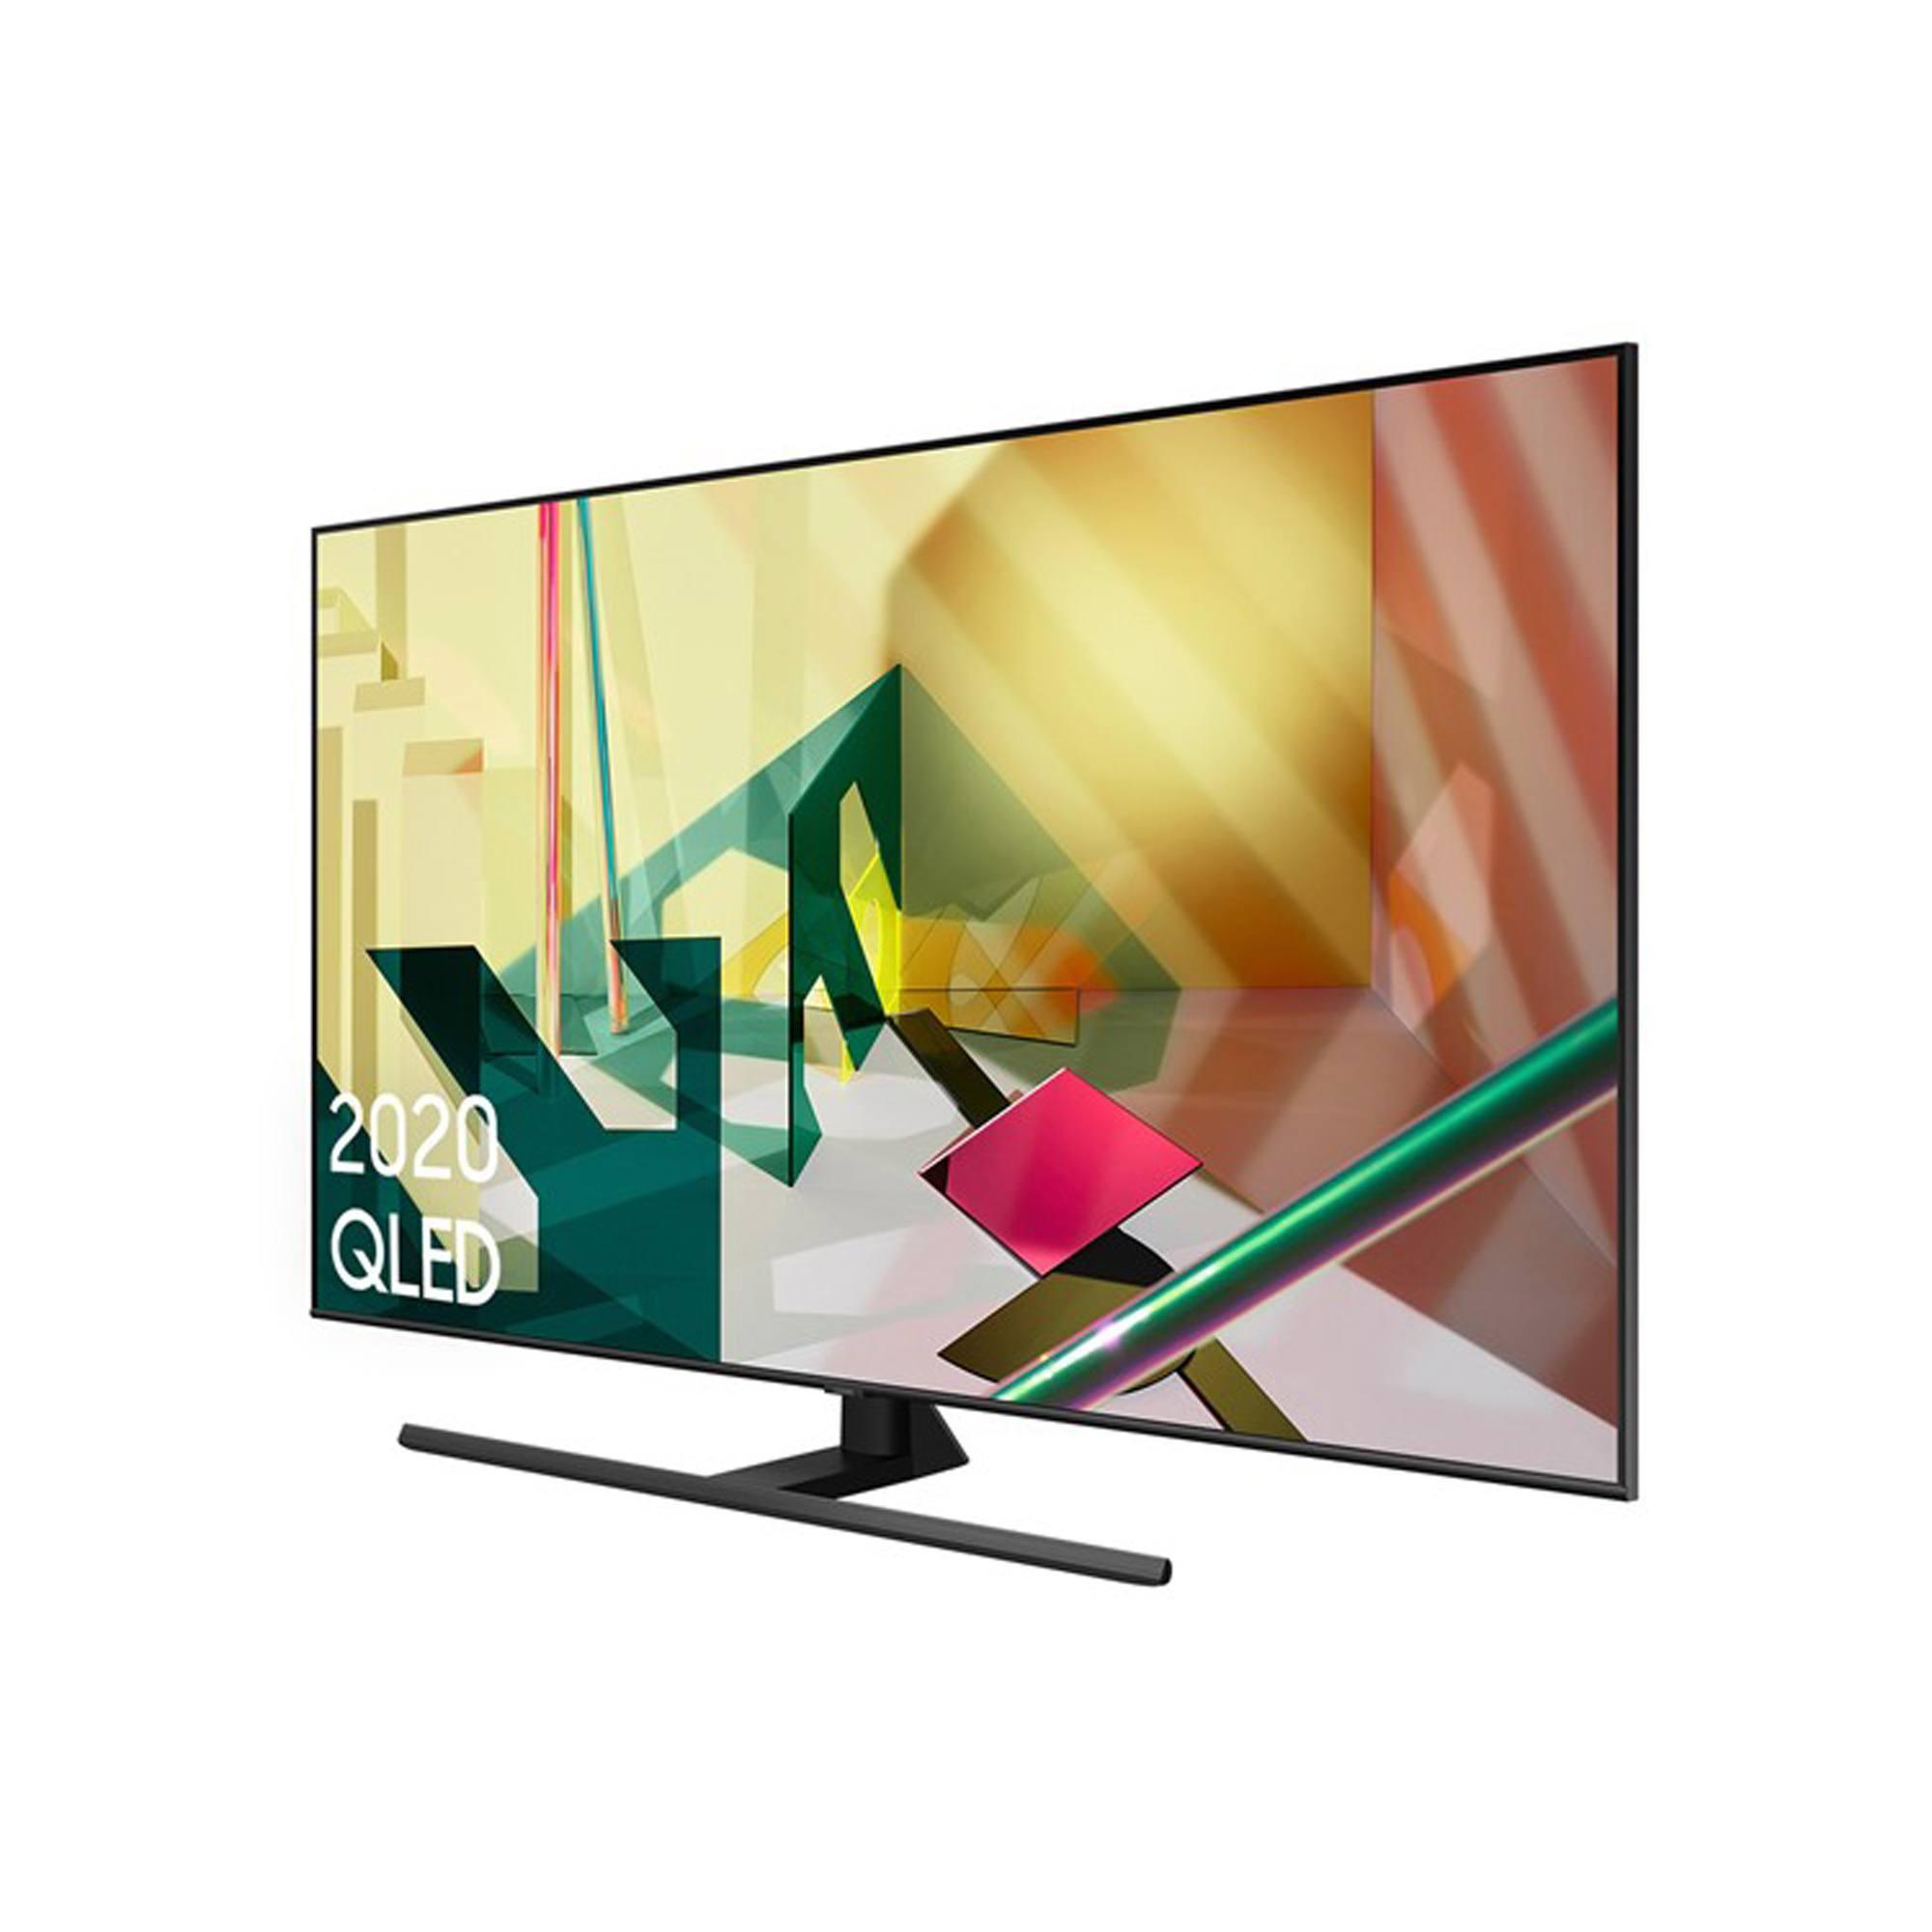 "Samsung QE55Q70T 55"" QLED 4K Quantum HDR Smart TV with Tizen OS"